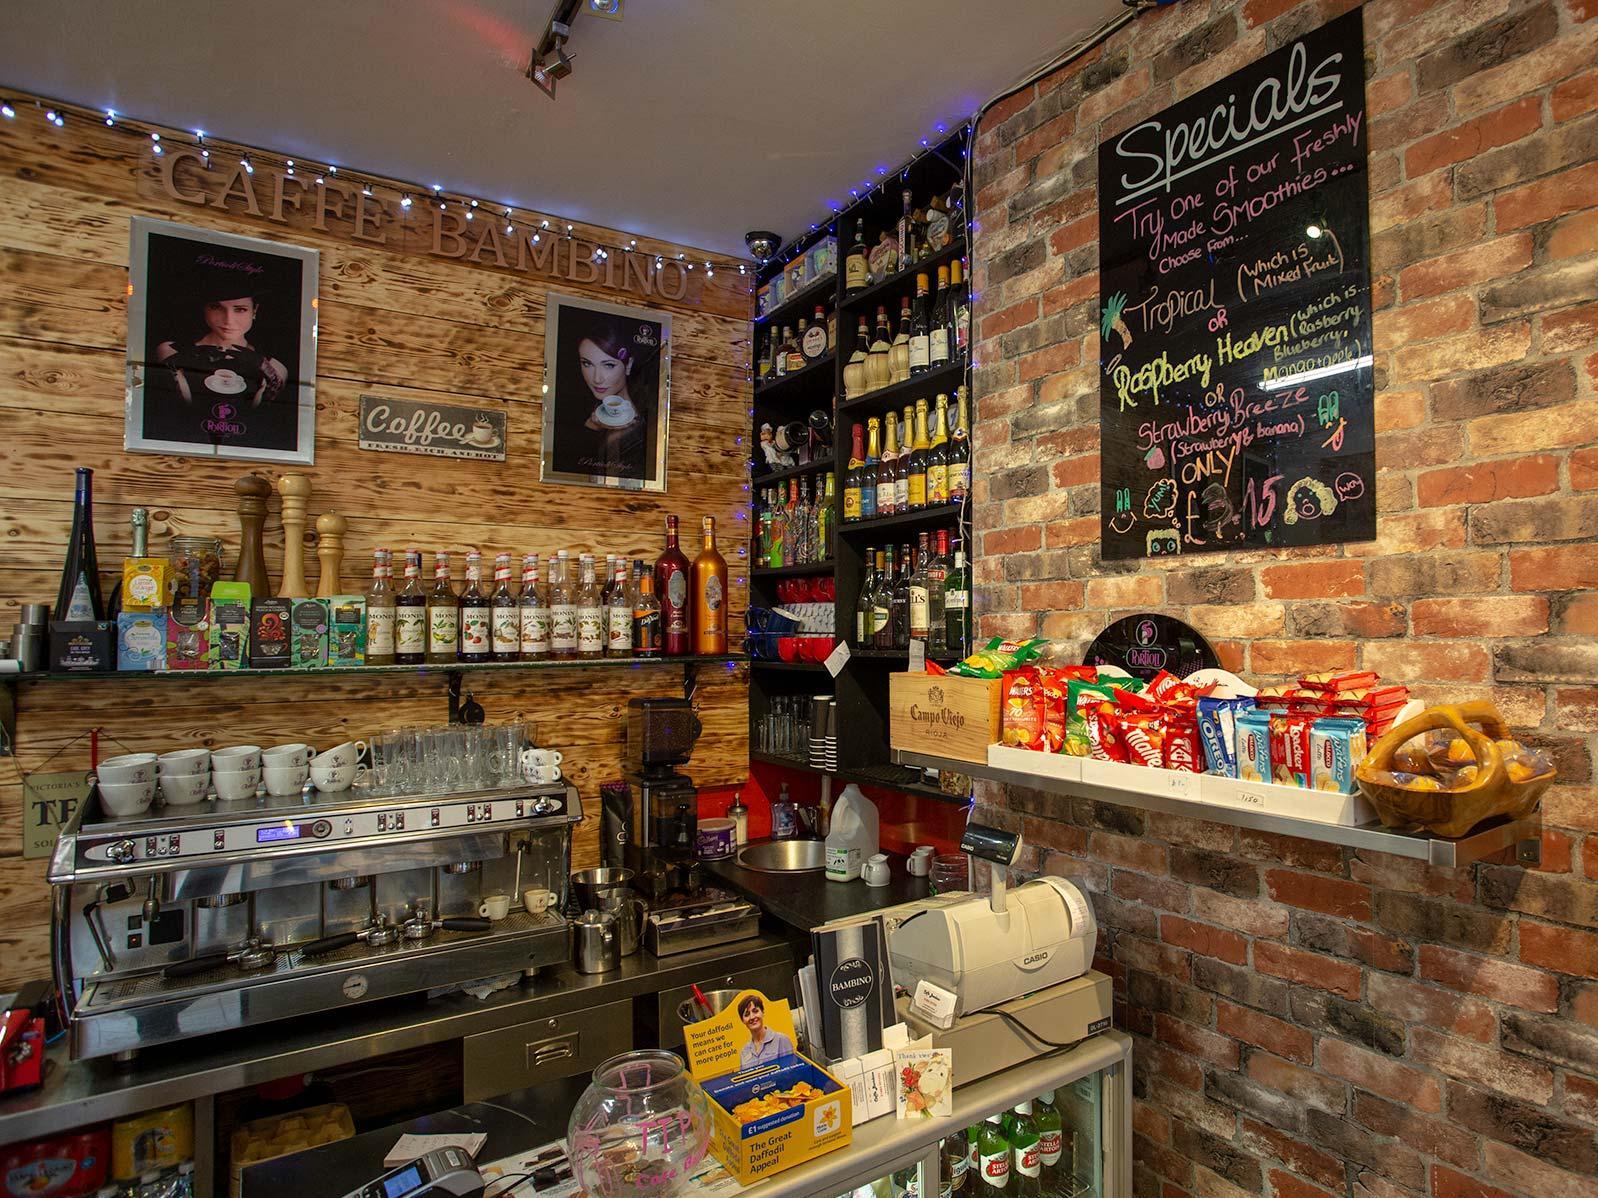 Caffe Bambino coffee shop in Caterham Valley, Surrey